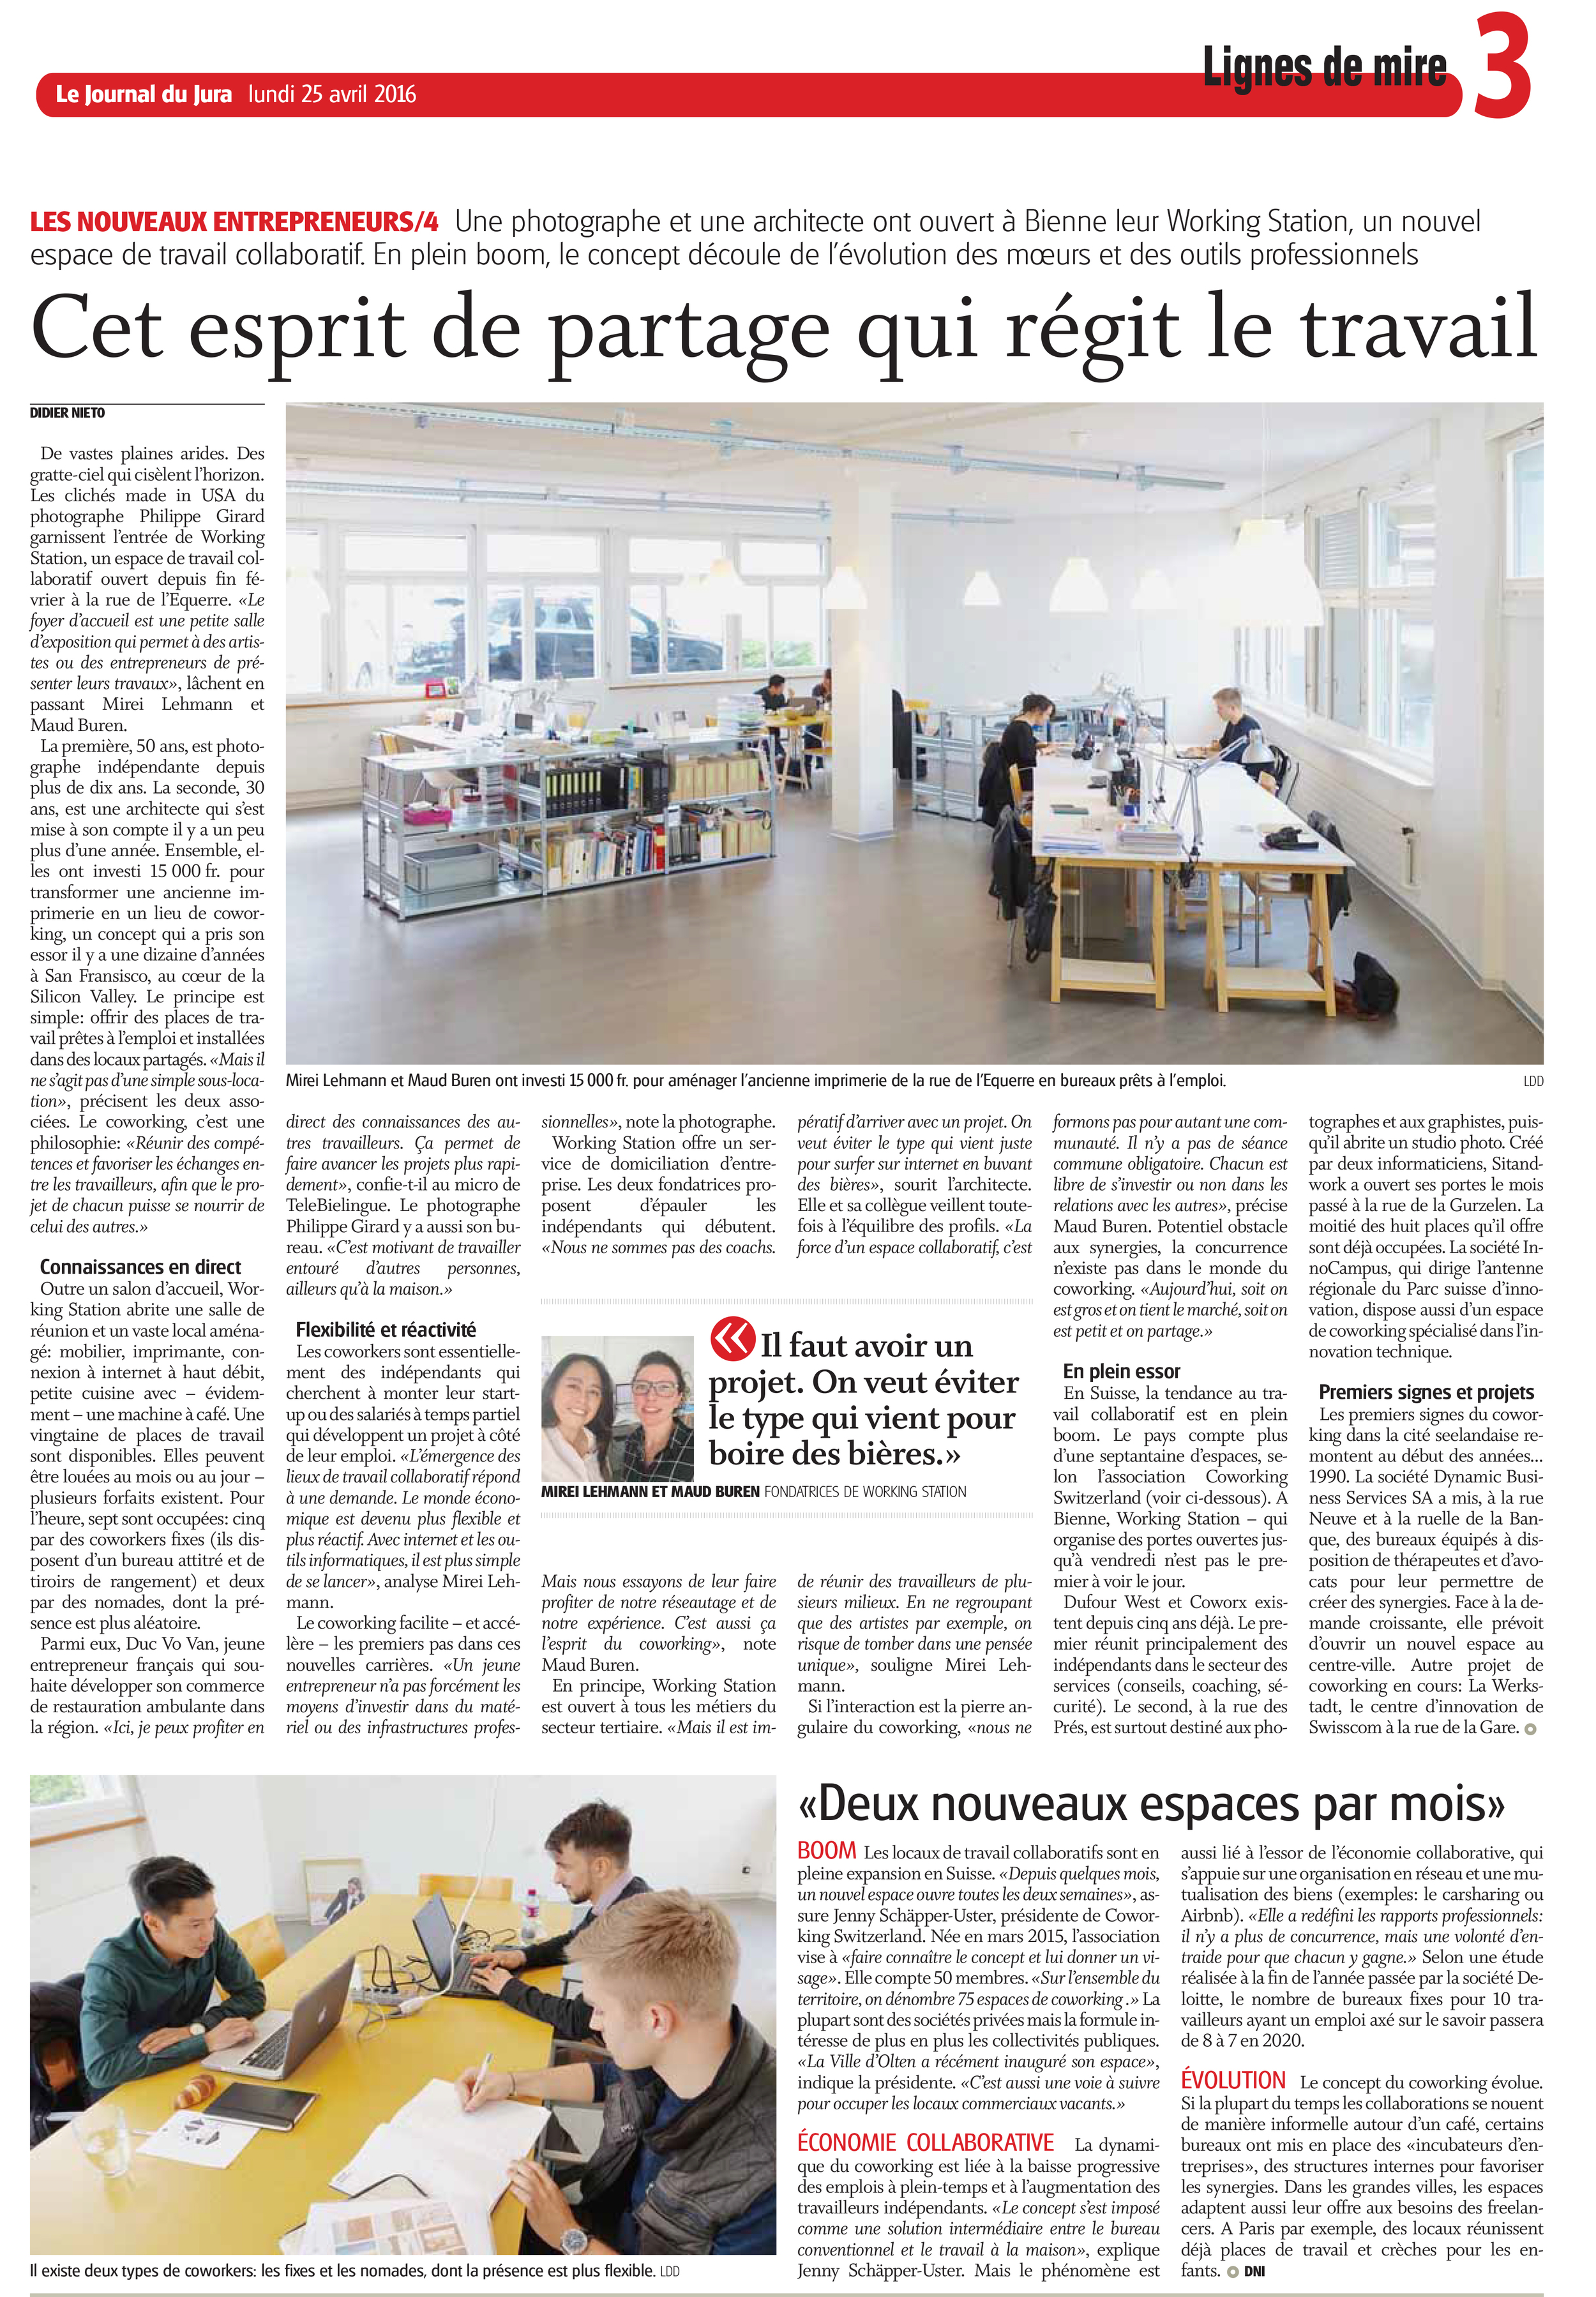 Journal du Jura / 25 juin 2016